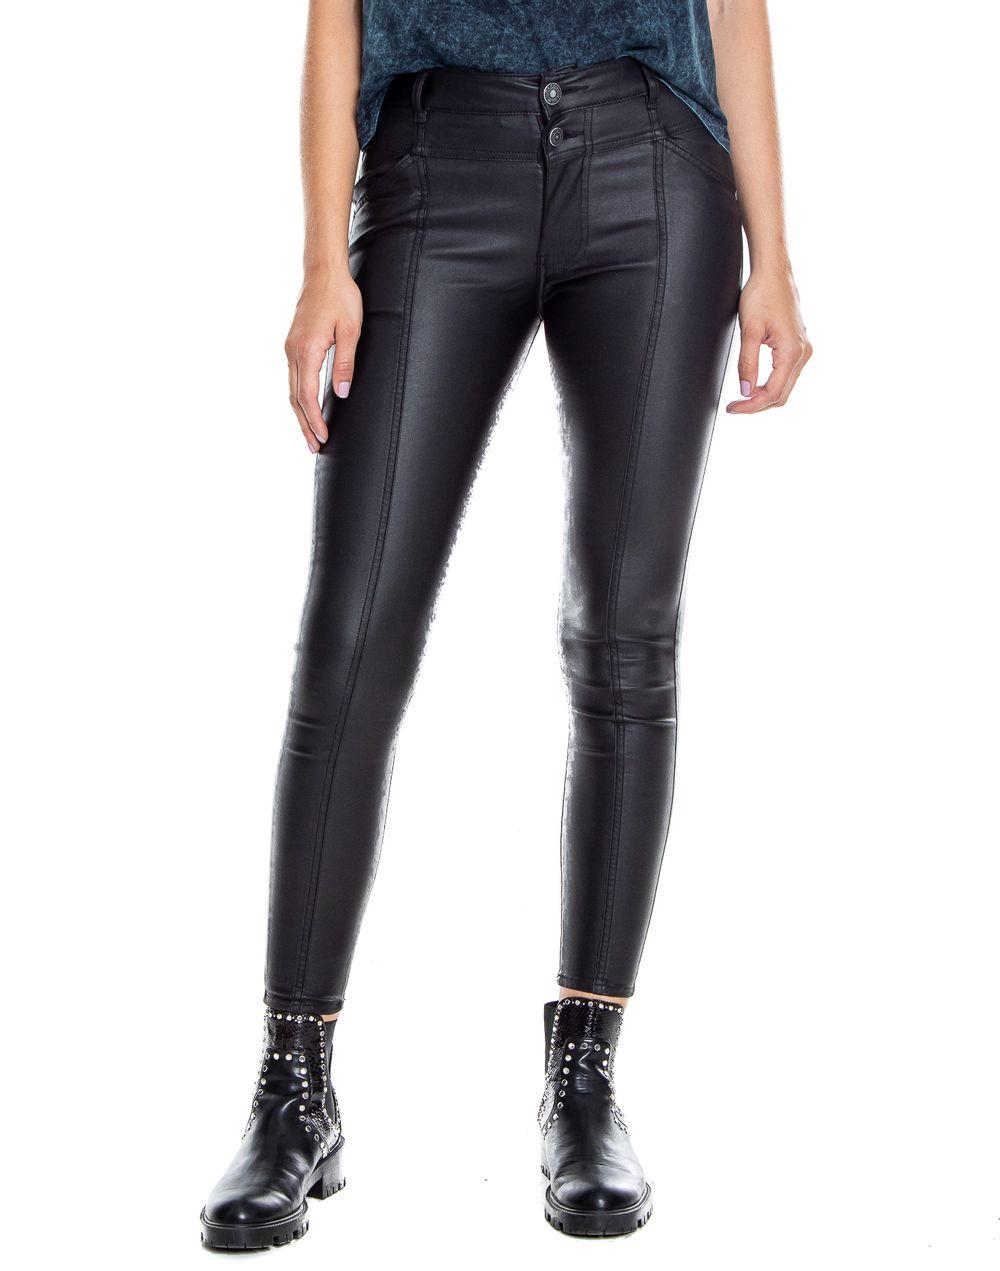 pantalon-044802-negro-1